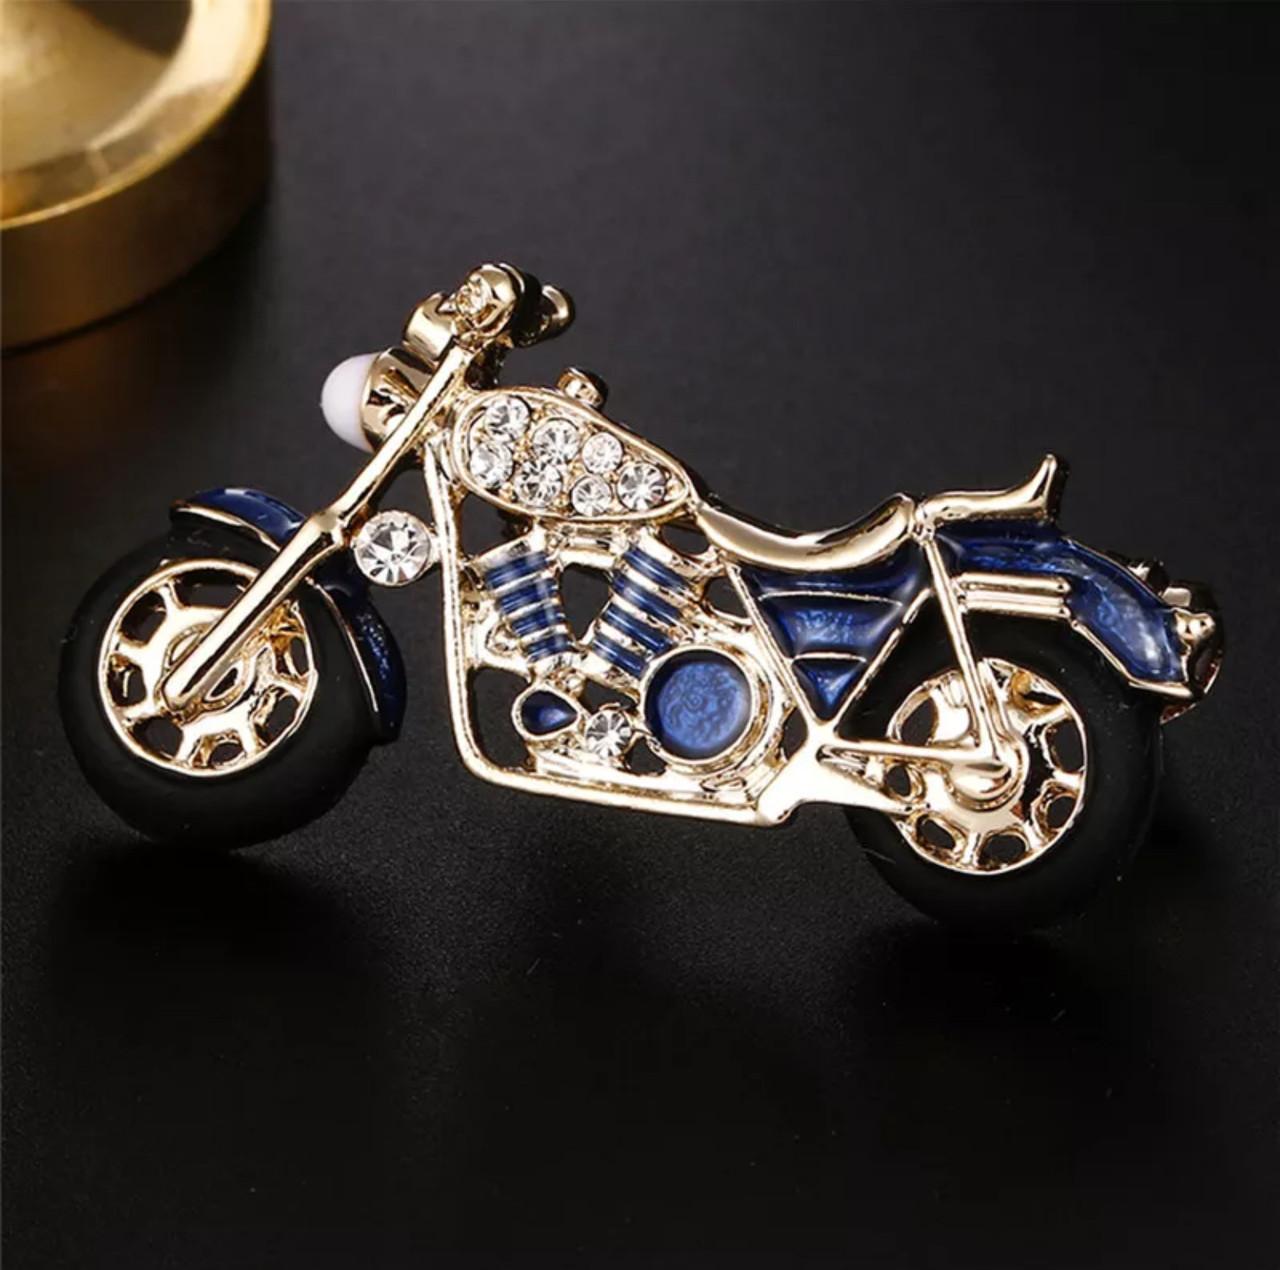 Брошь унисекс яркая «Motobike» для байкеров синяя